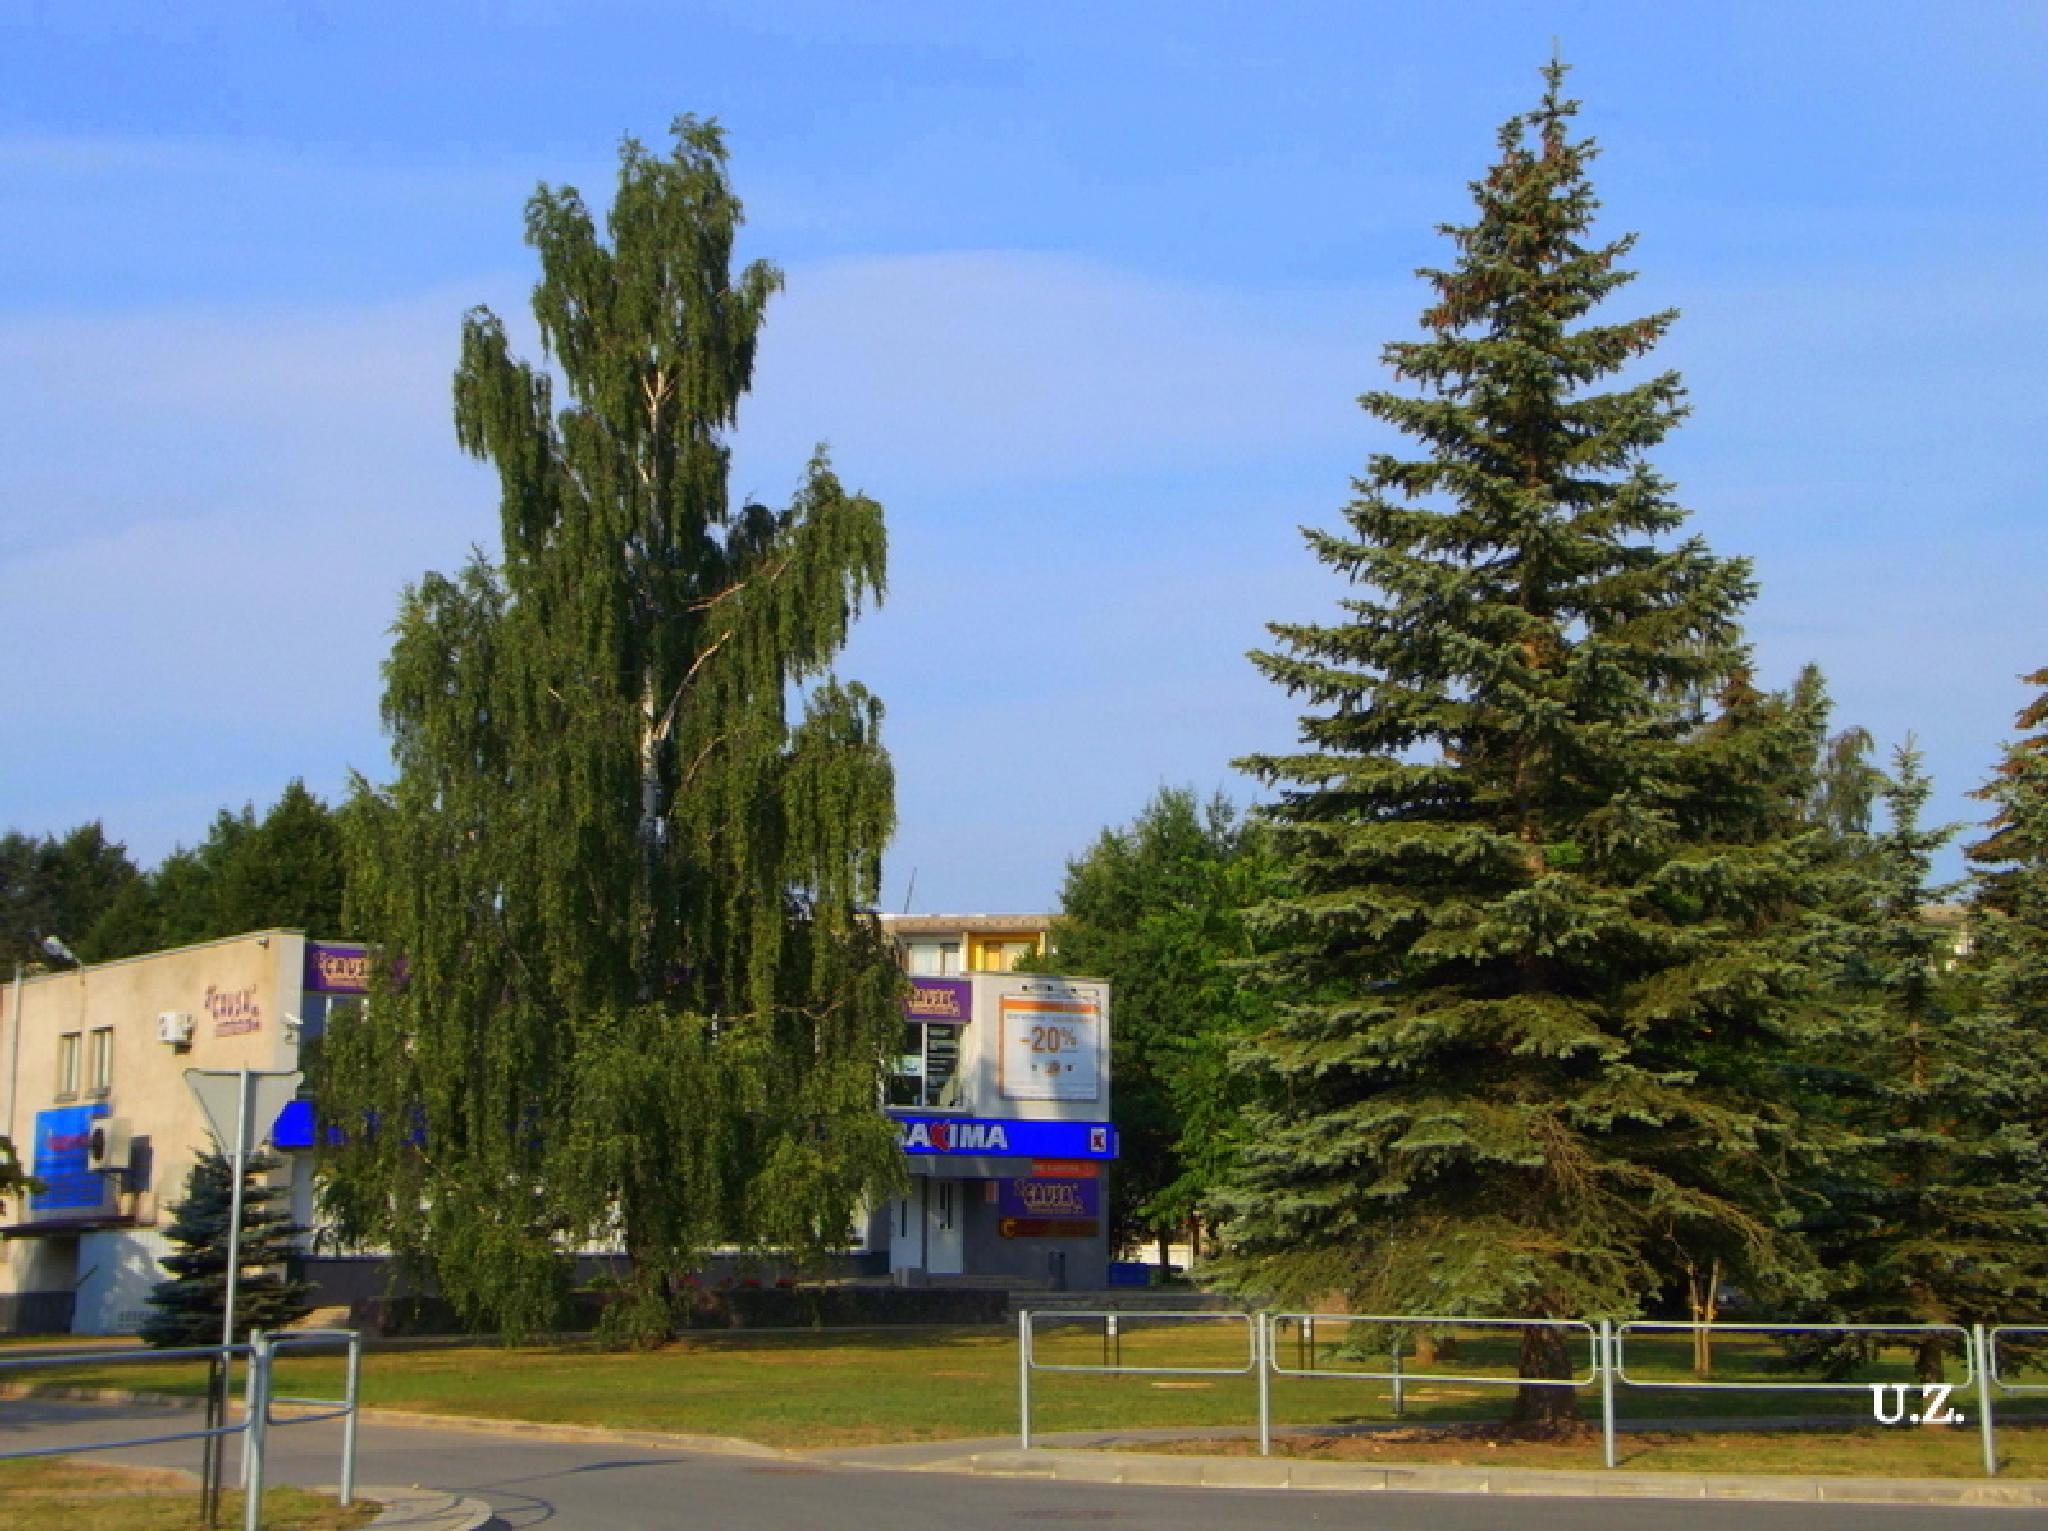 Trees in the city by Zita Užkuraitienė